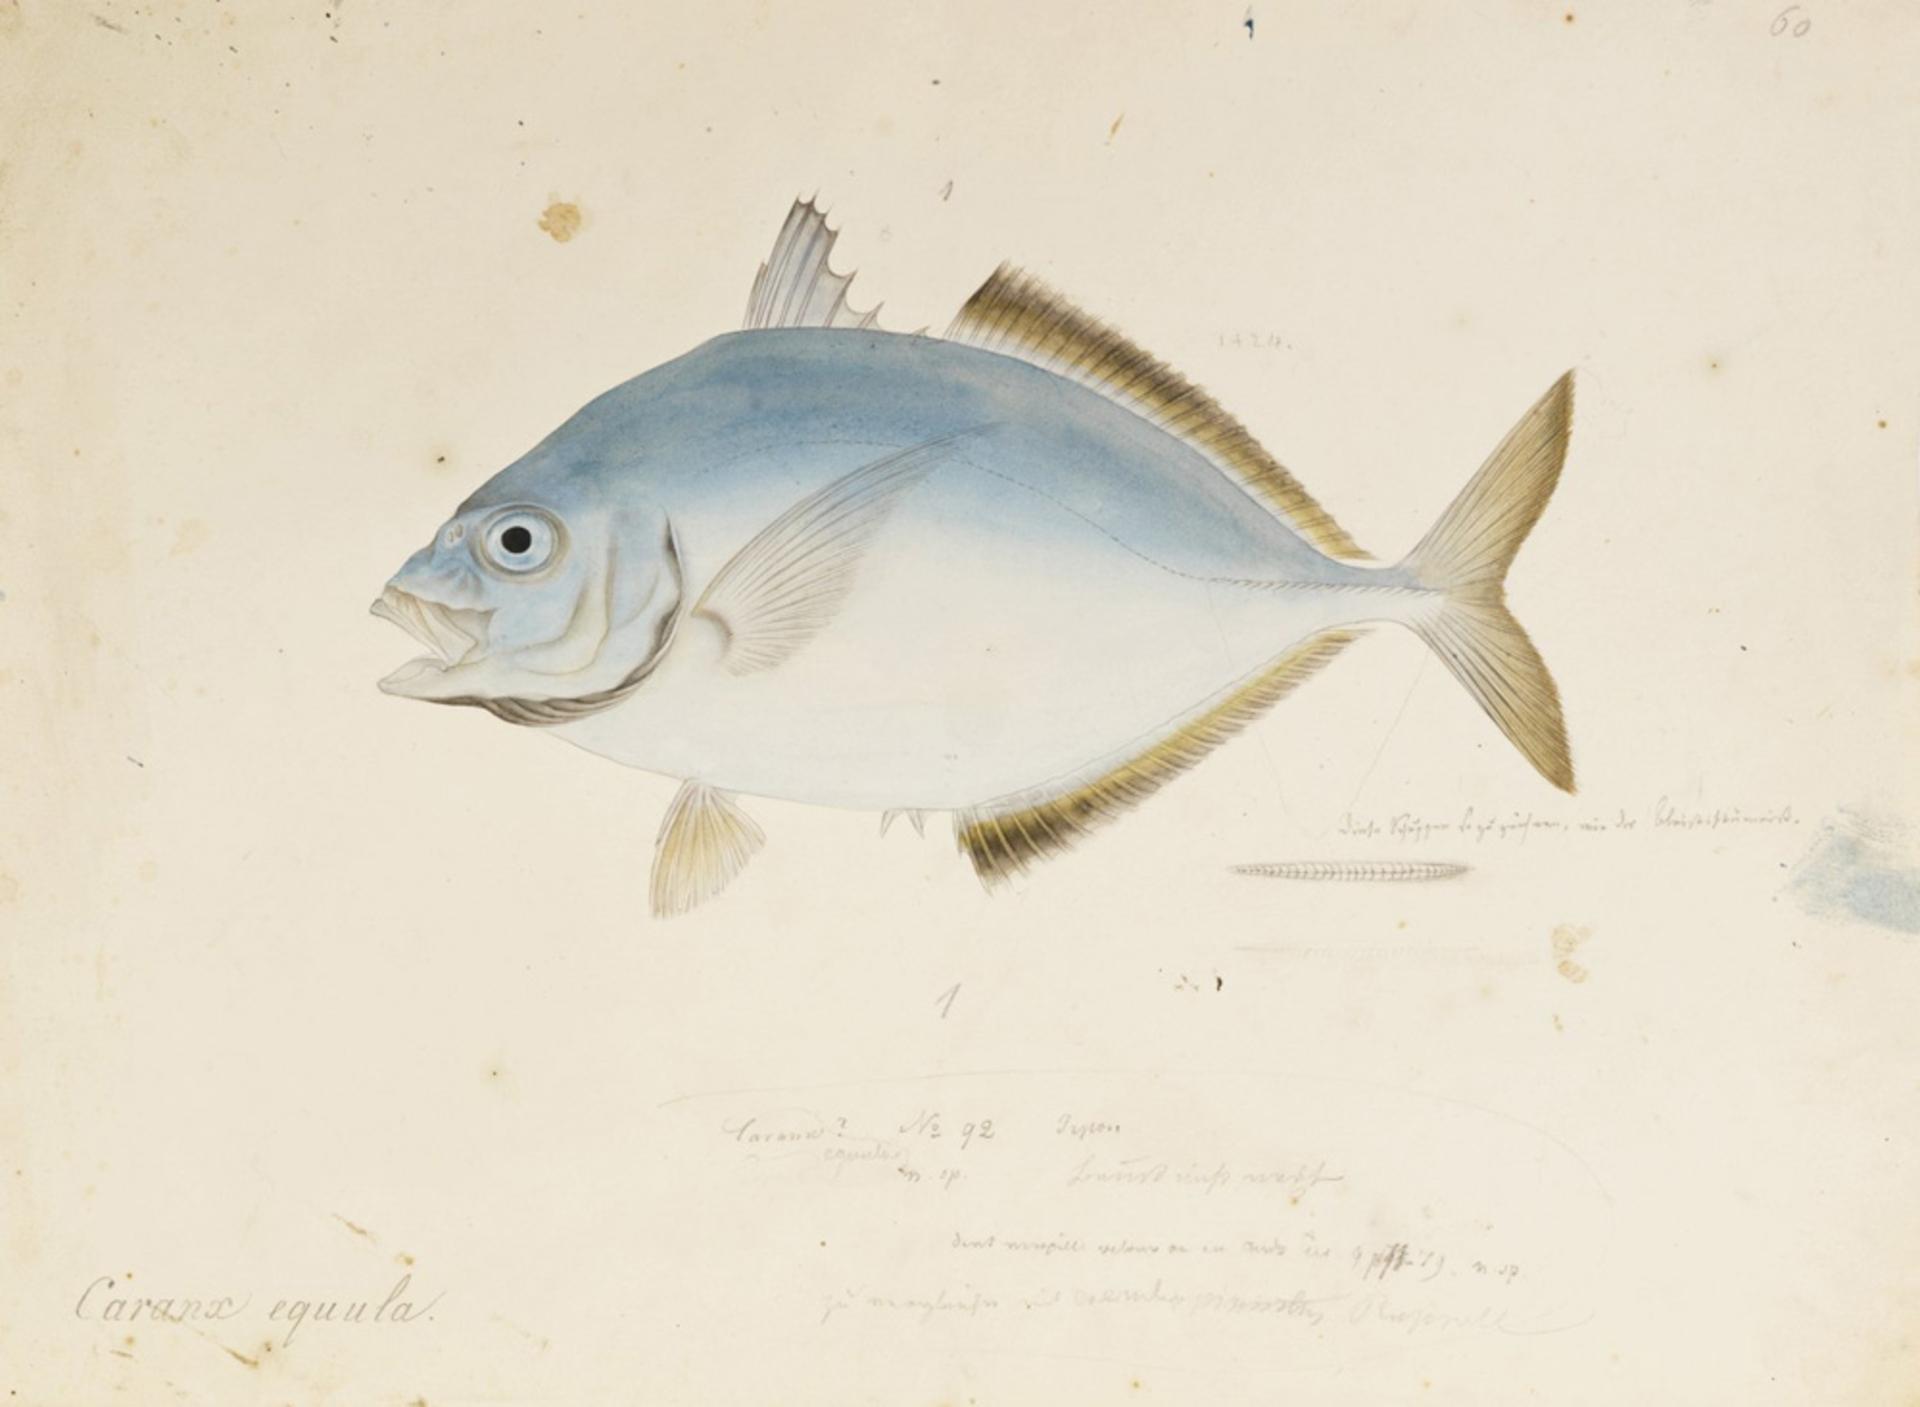 RMNH.ART.580 | Kaiwarinus equula